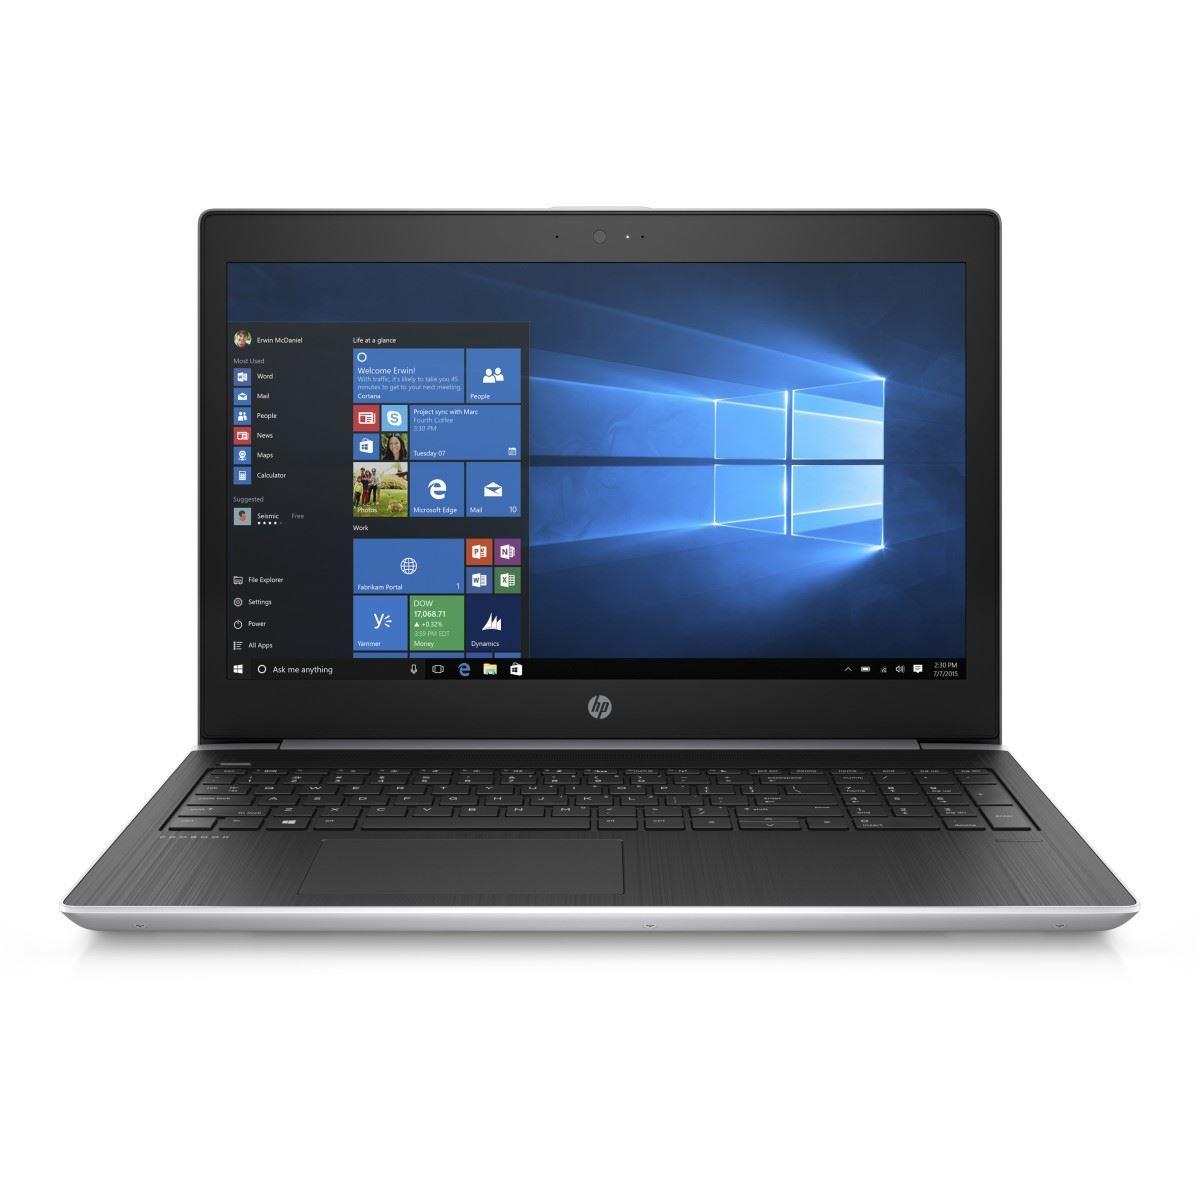 HP ProBook 450 G5 i3-8130U 15.6 FHD UWVA CAM, 8GB, 128GB SSD+1TB, FpR, WiFi ac, BT,Win10